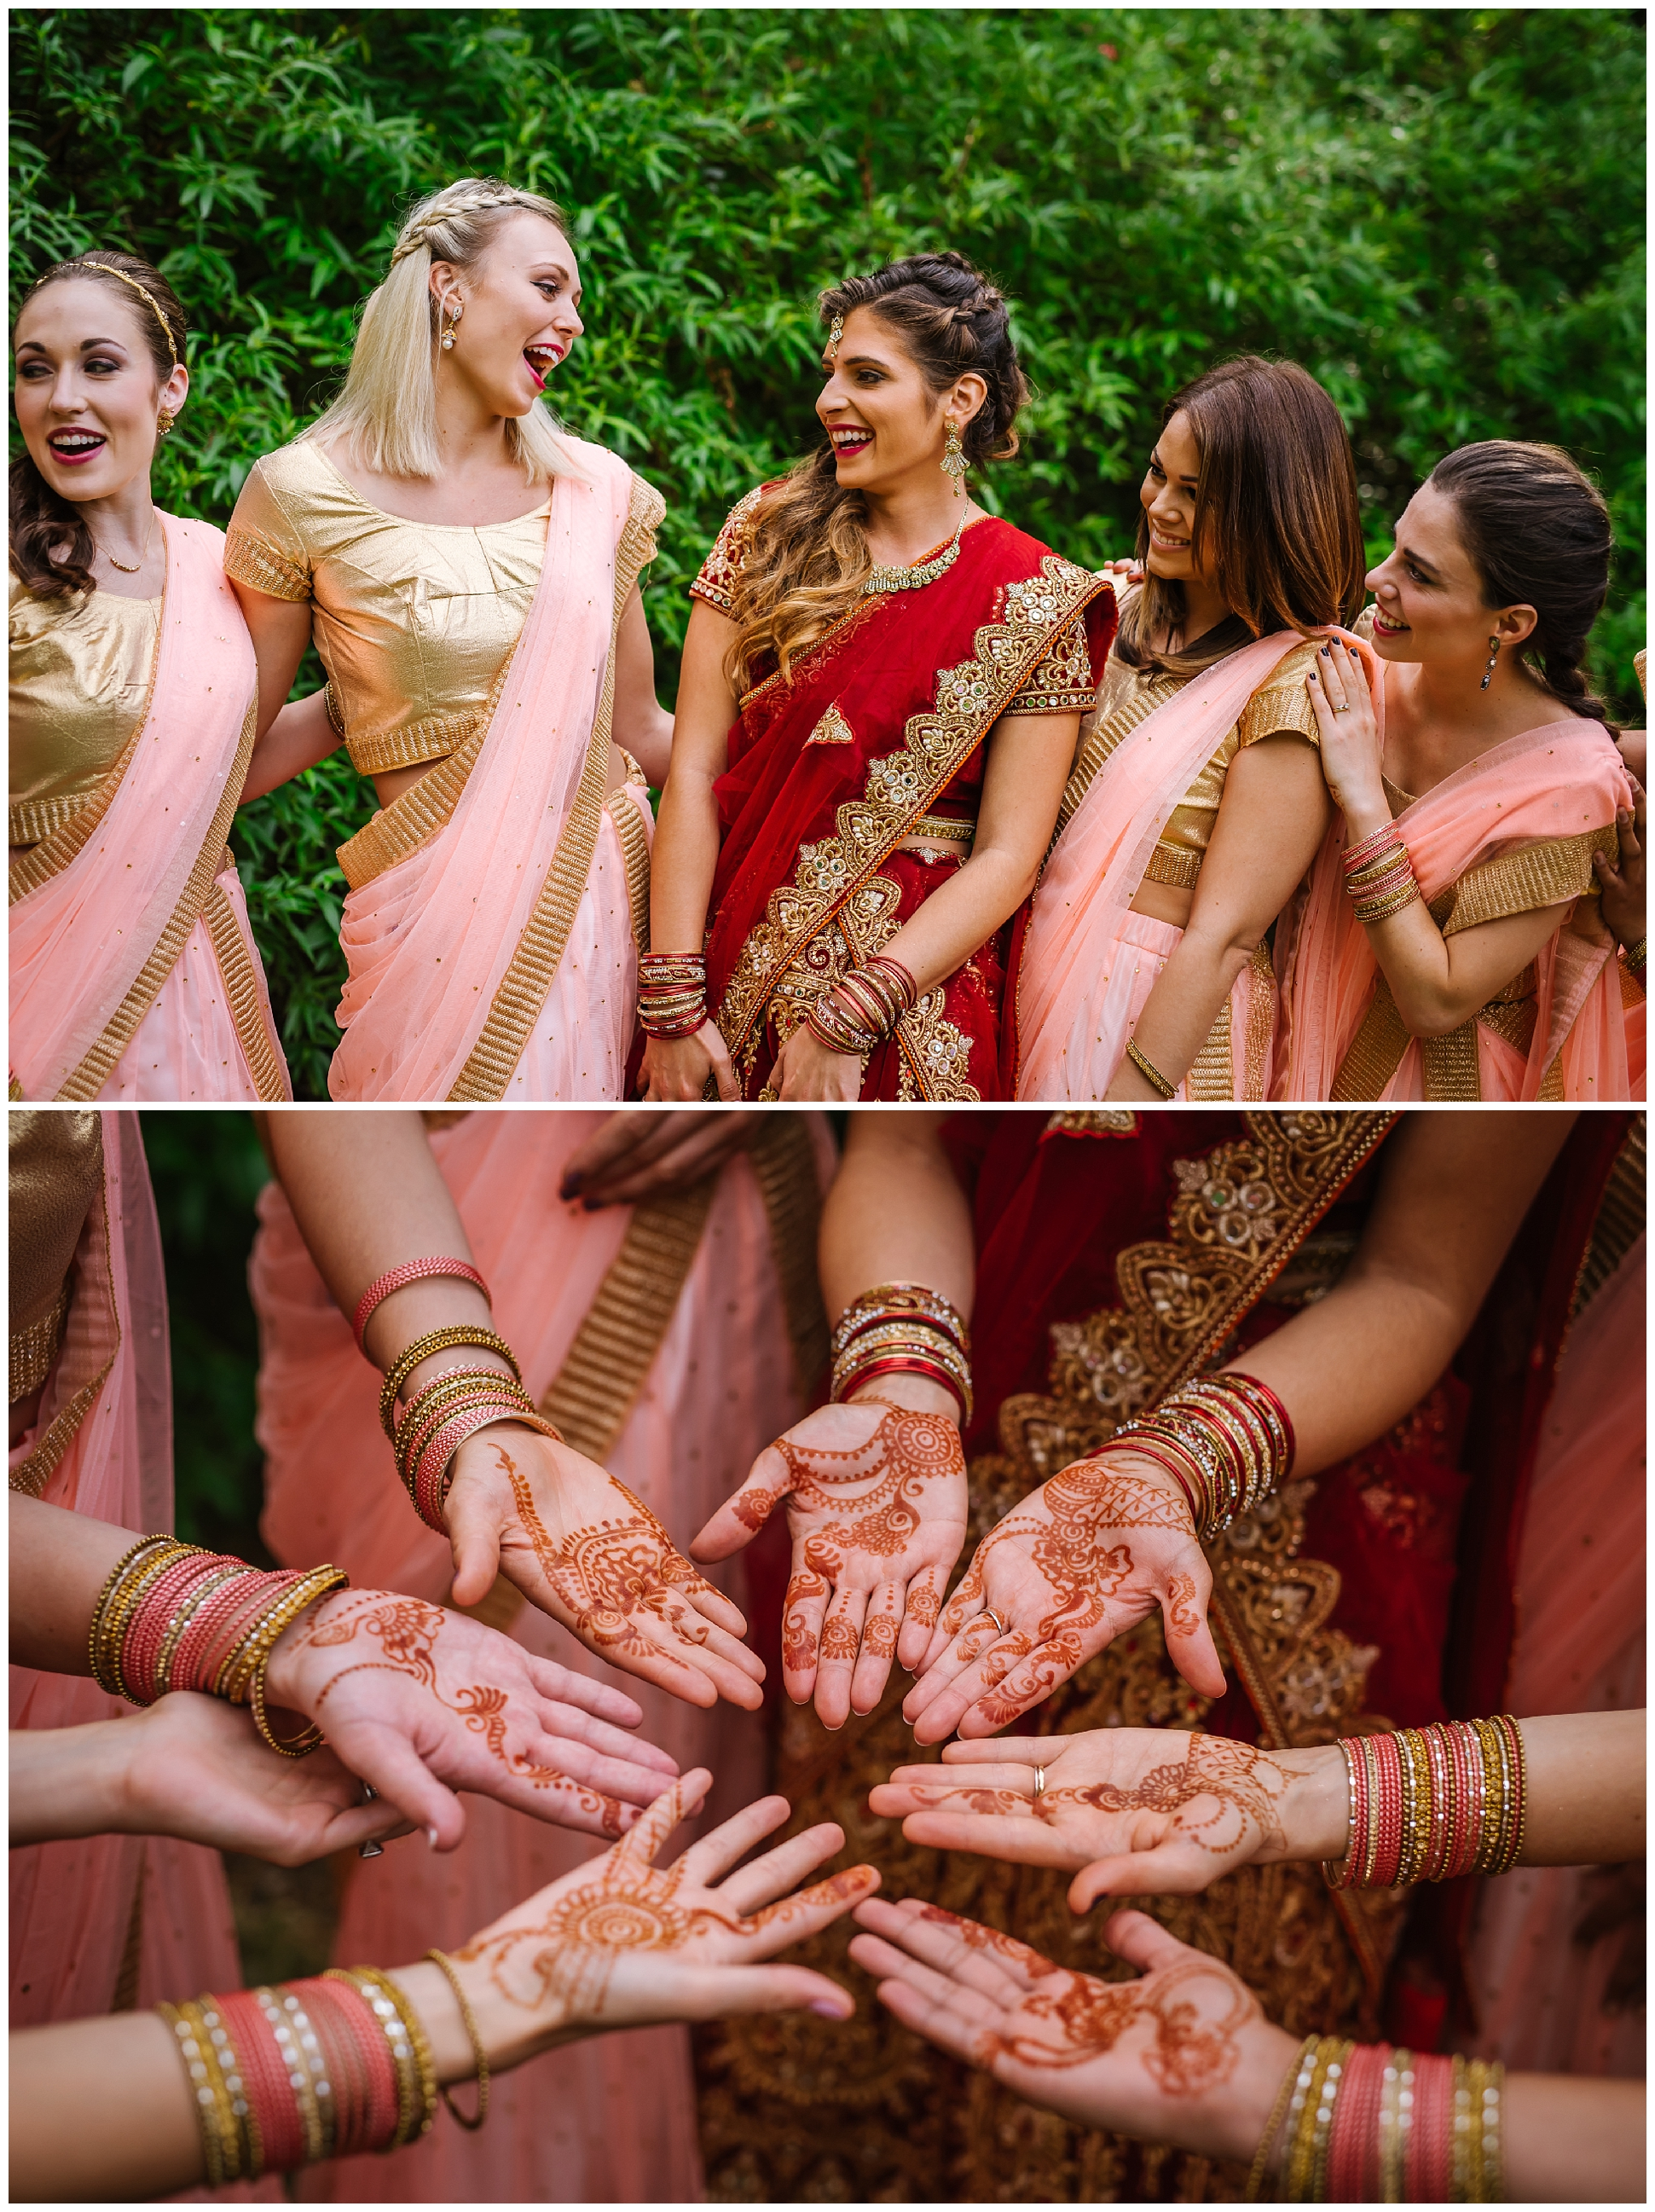 St-pete-indian-wedding-photographer-barat-sunken-gardens_0079.jpg